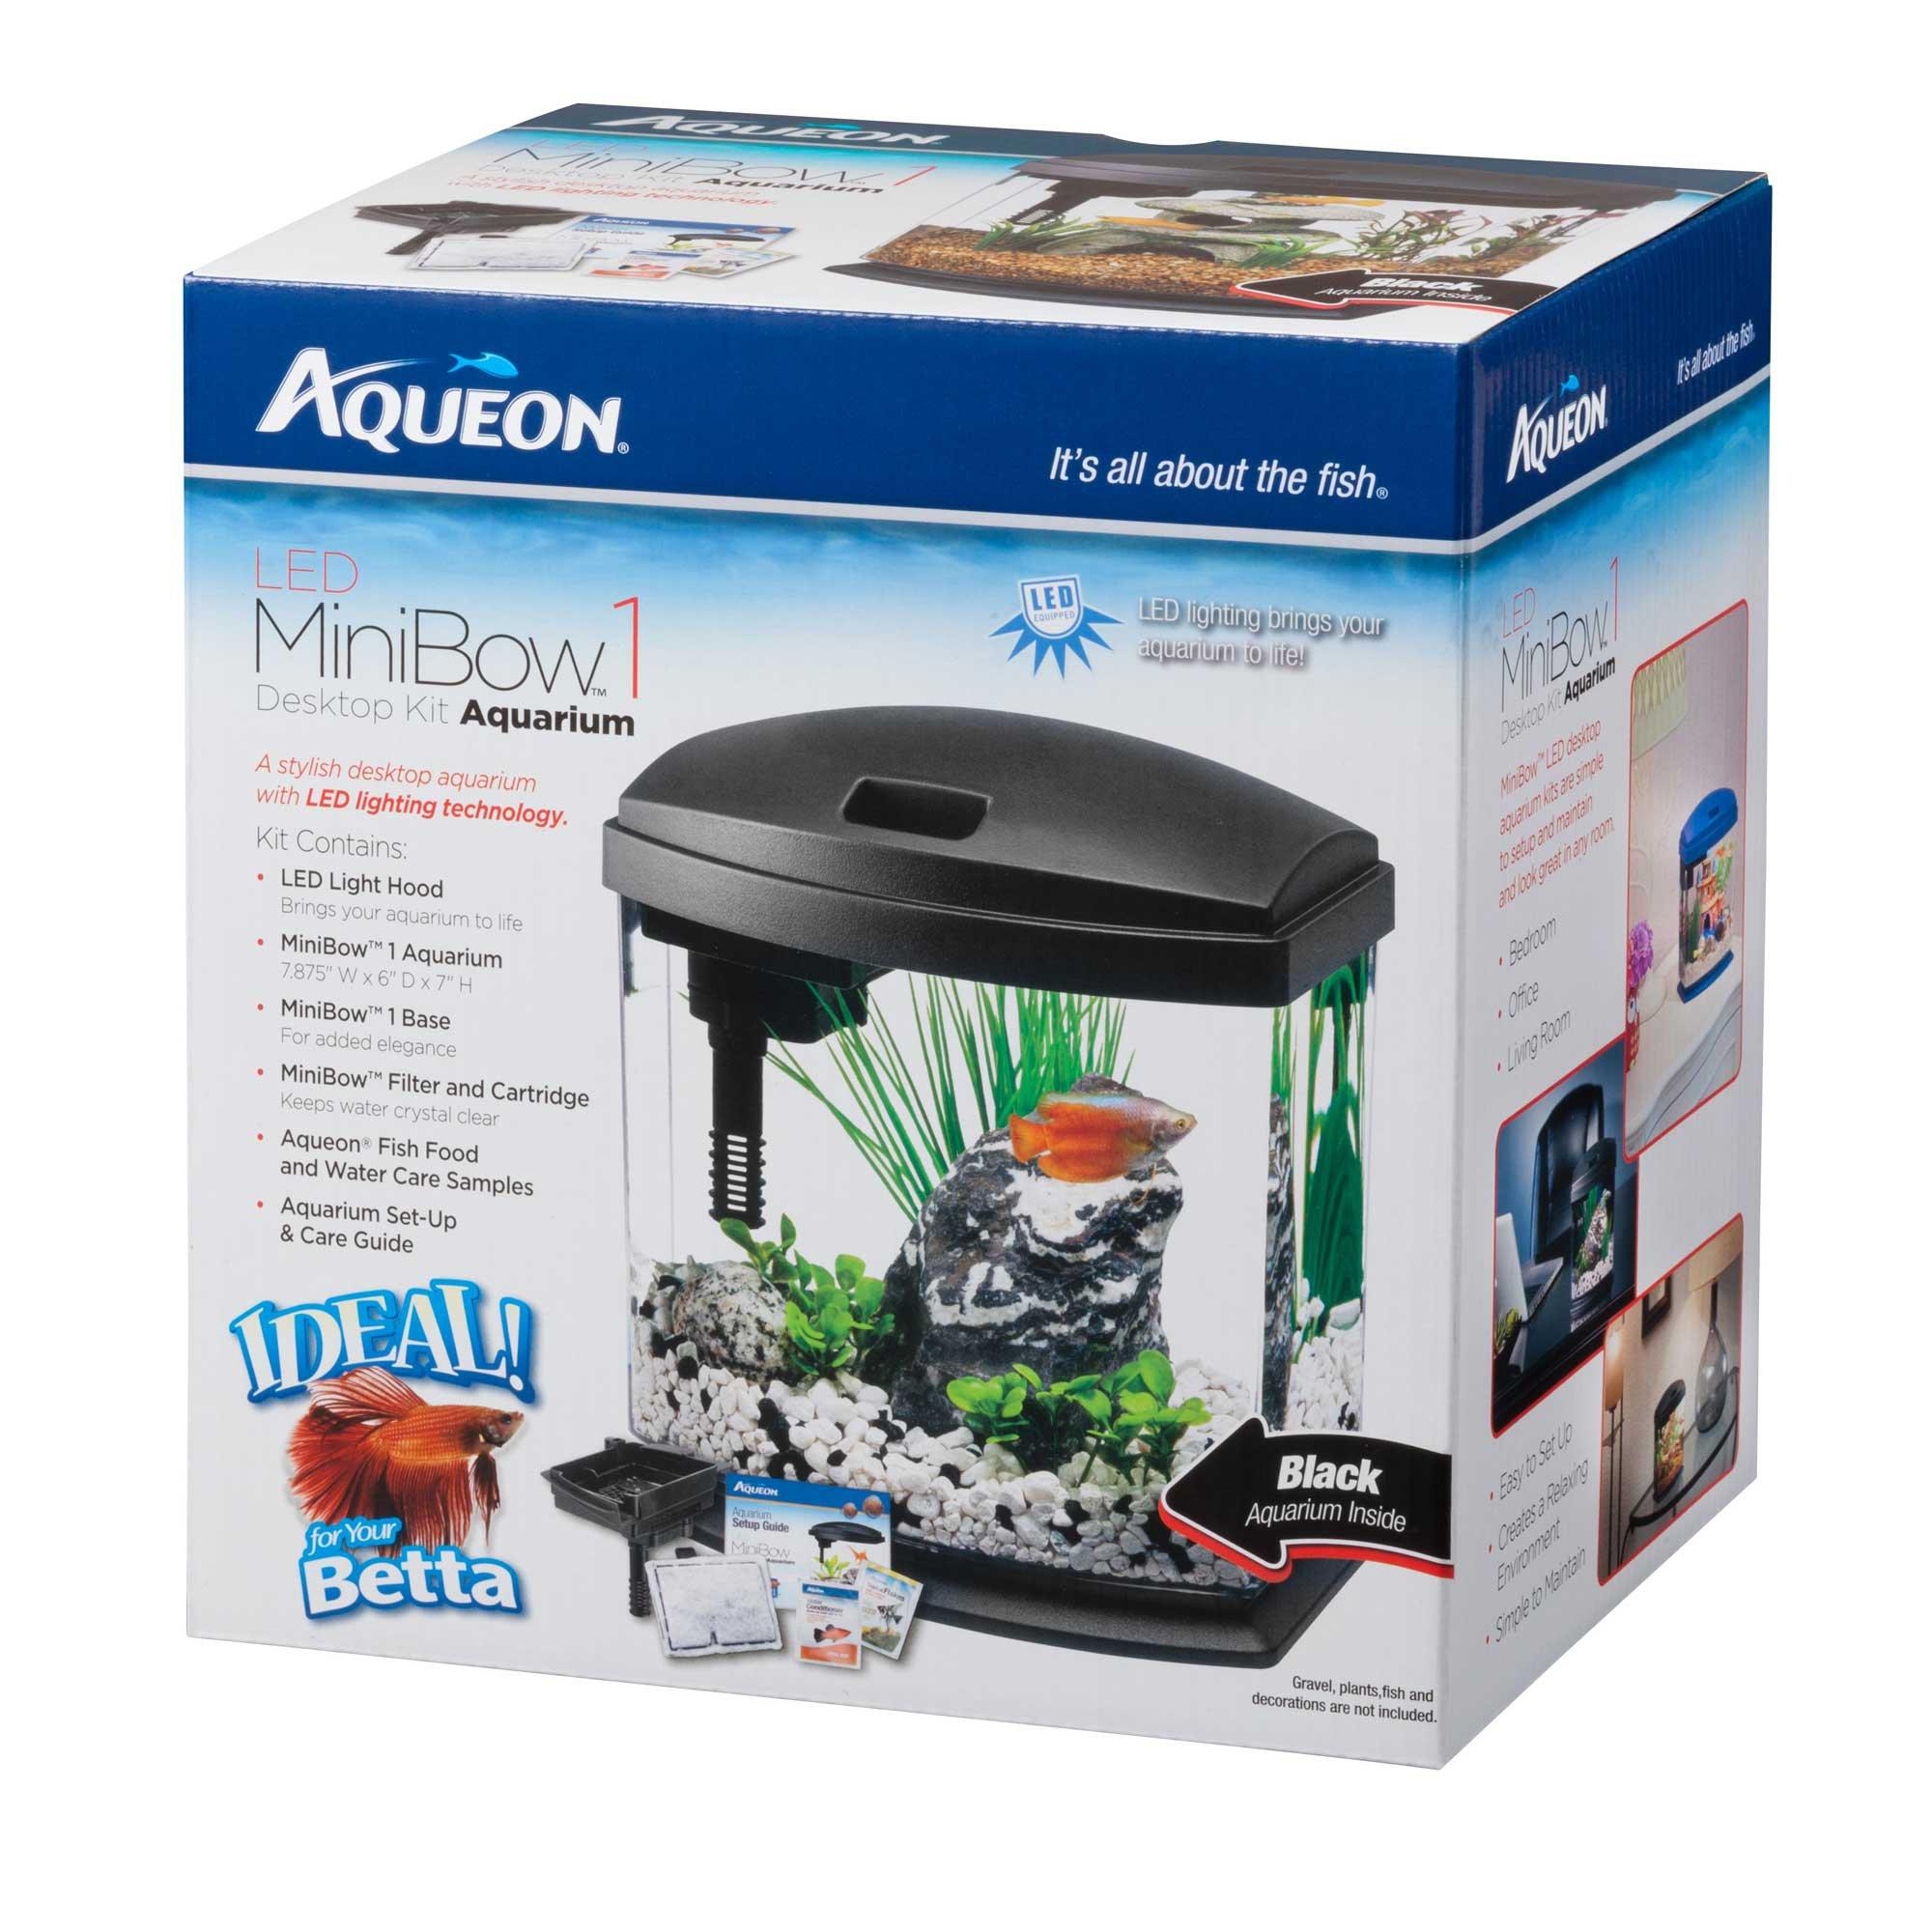 Aqueon MiniBow Black LED Desktop Fish Aquarium Kit